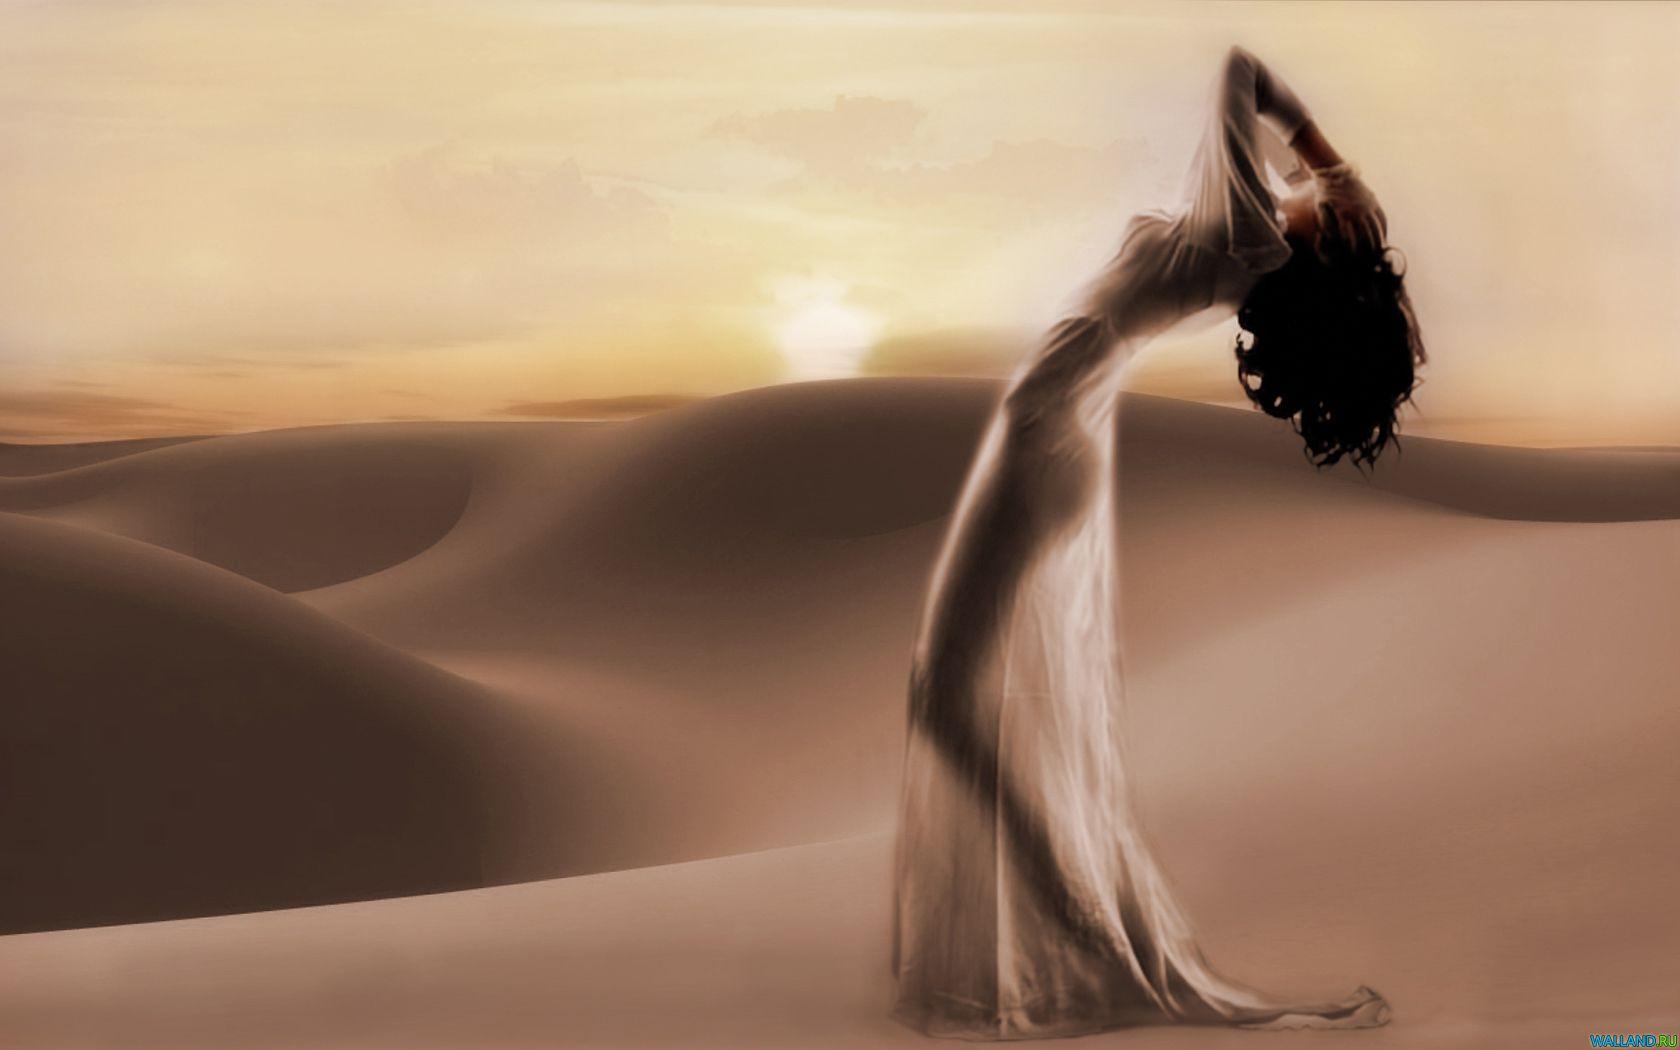 Фото девушки в пустыне фото 128-399